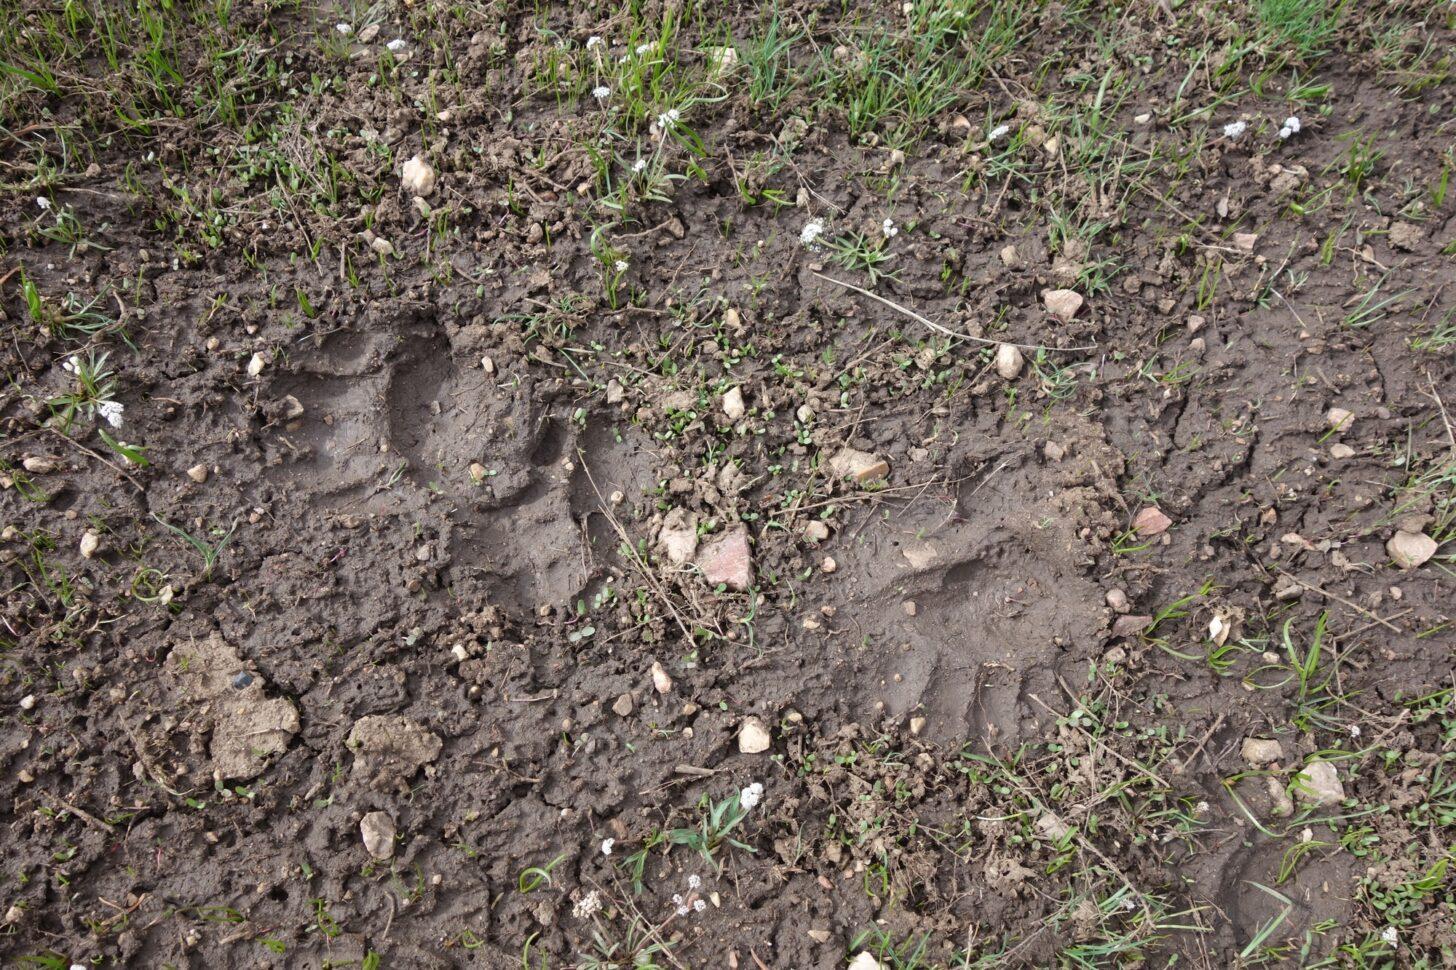 bear tracks in the mud